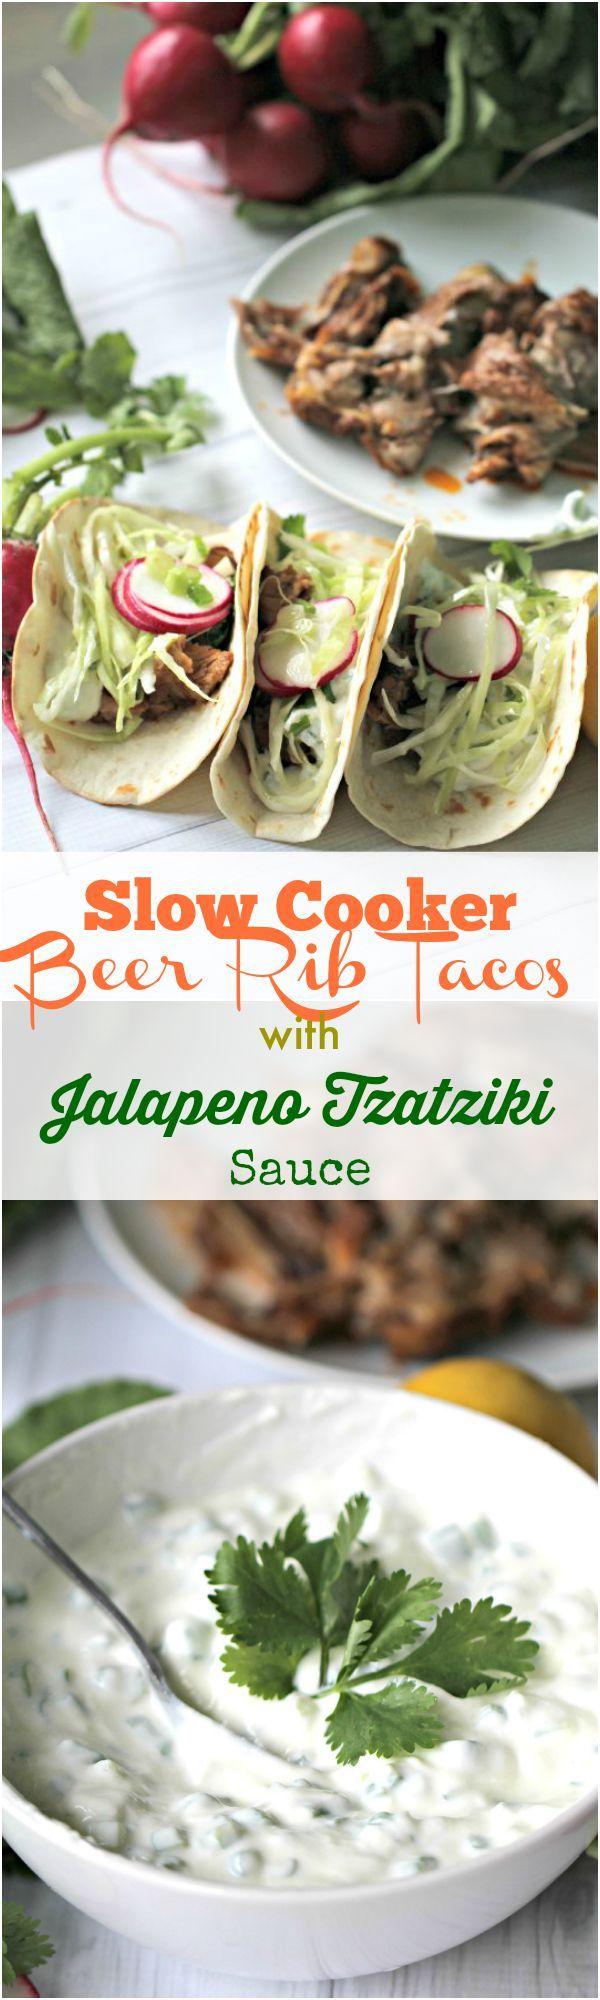 Slow Cooker Beer Ribs Tacos with Jalapeño Tzatziki Sauce - Peas and Peonies